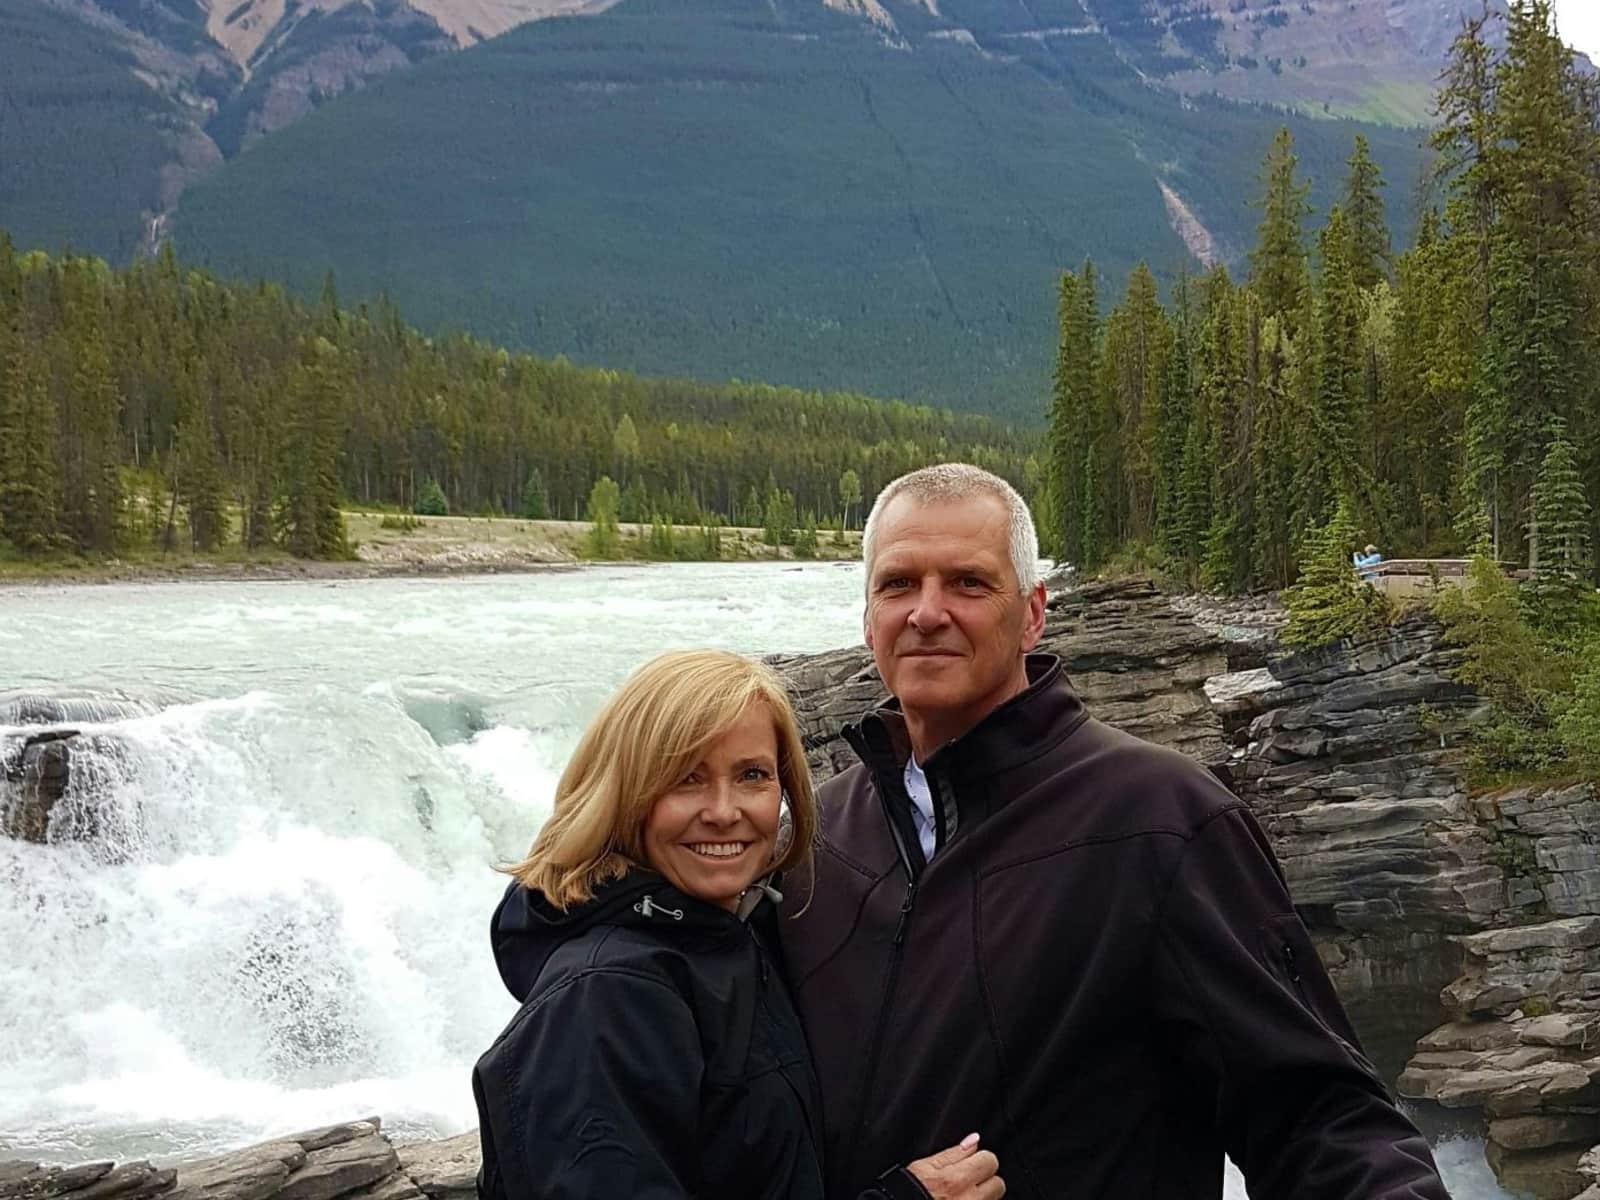 Robert & Shelley from Edmonton, Alberta, Canada